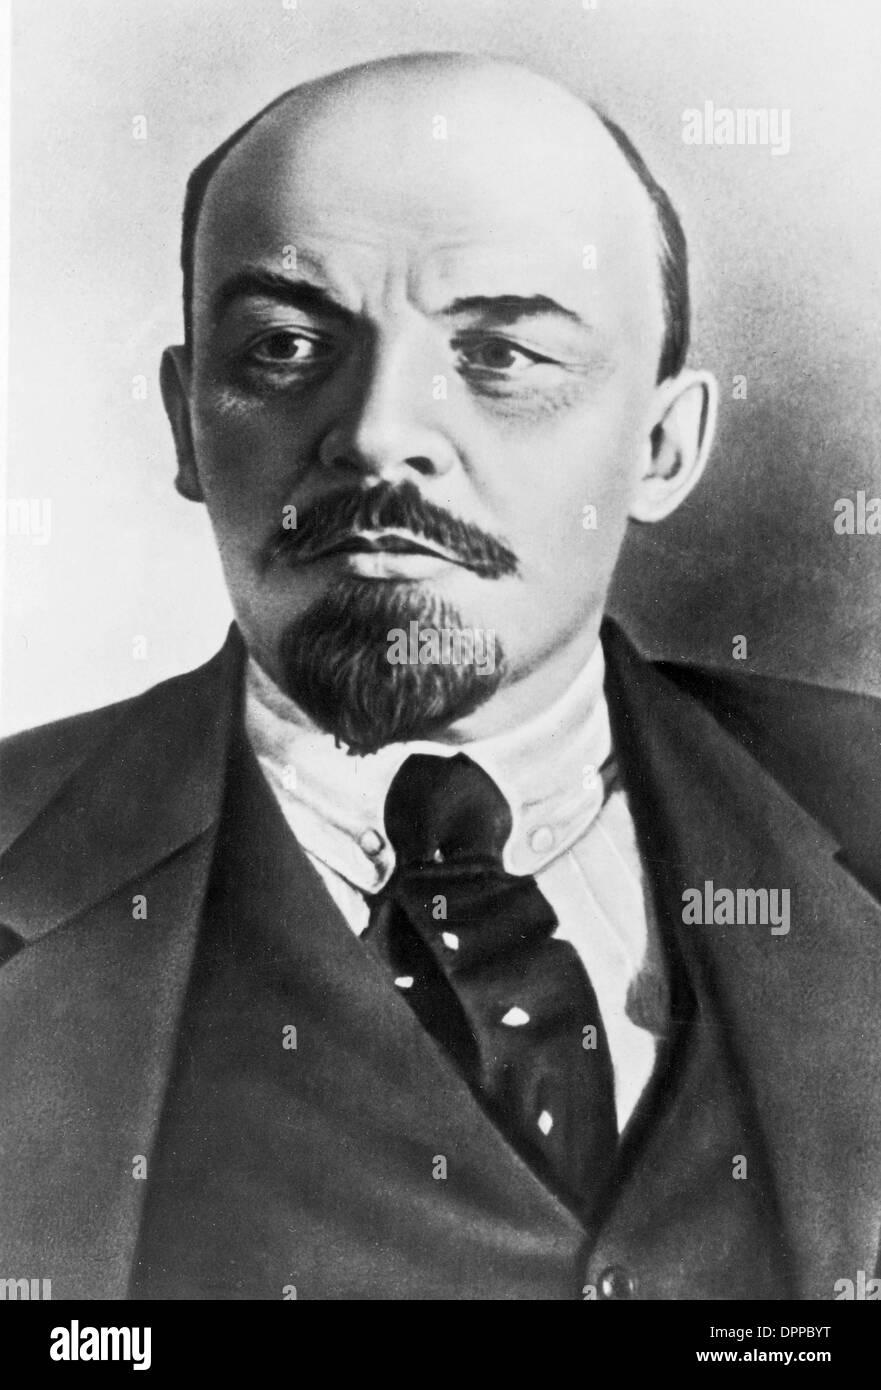 Vladimir Ilyich Lenin, Russian communist revolutionary, politician and Premier of the Soviet Union - Stock Image